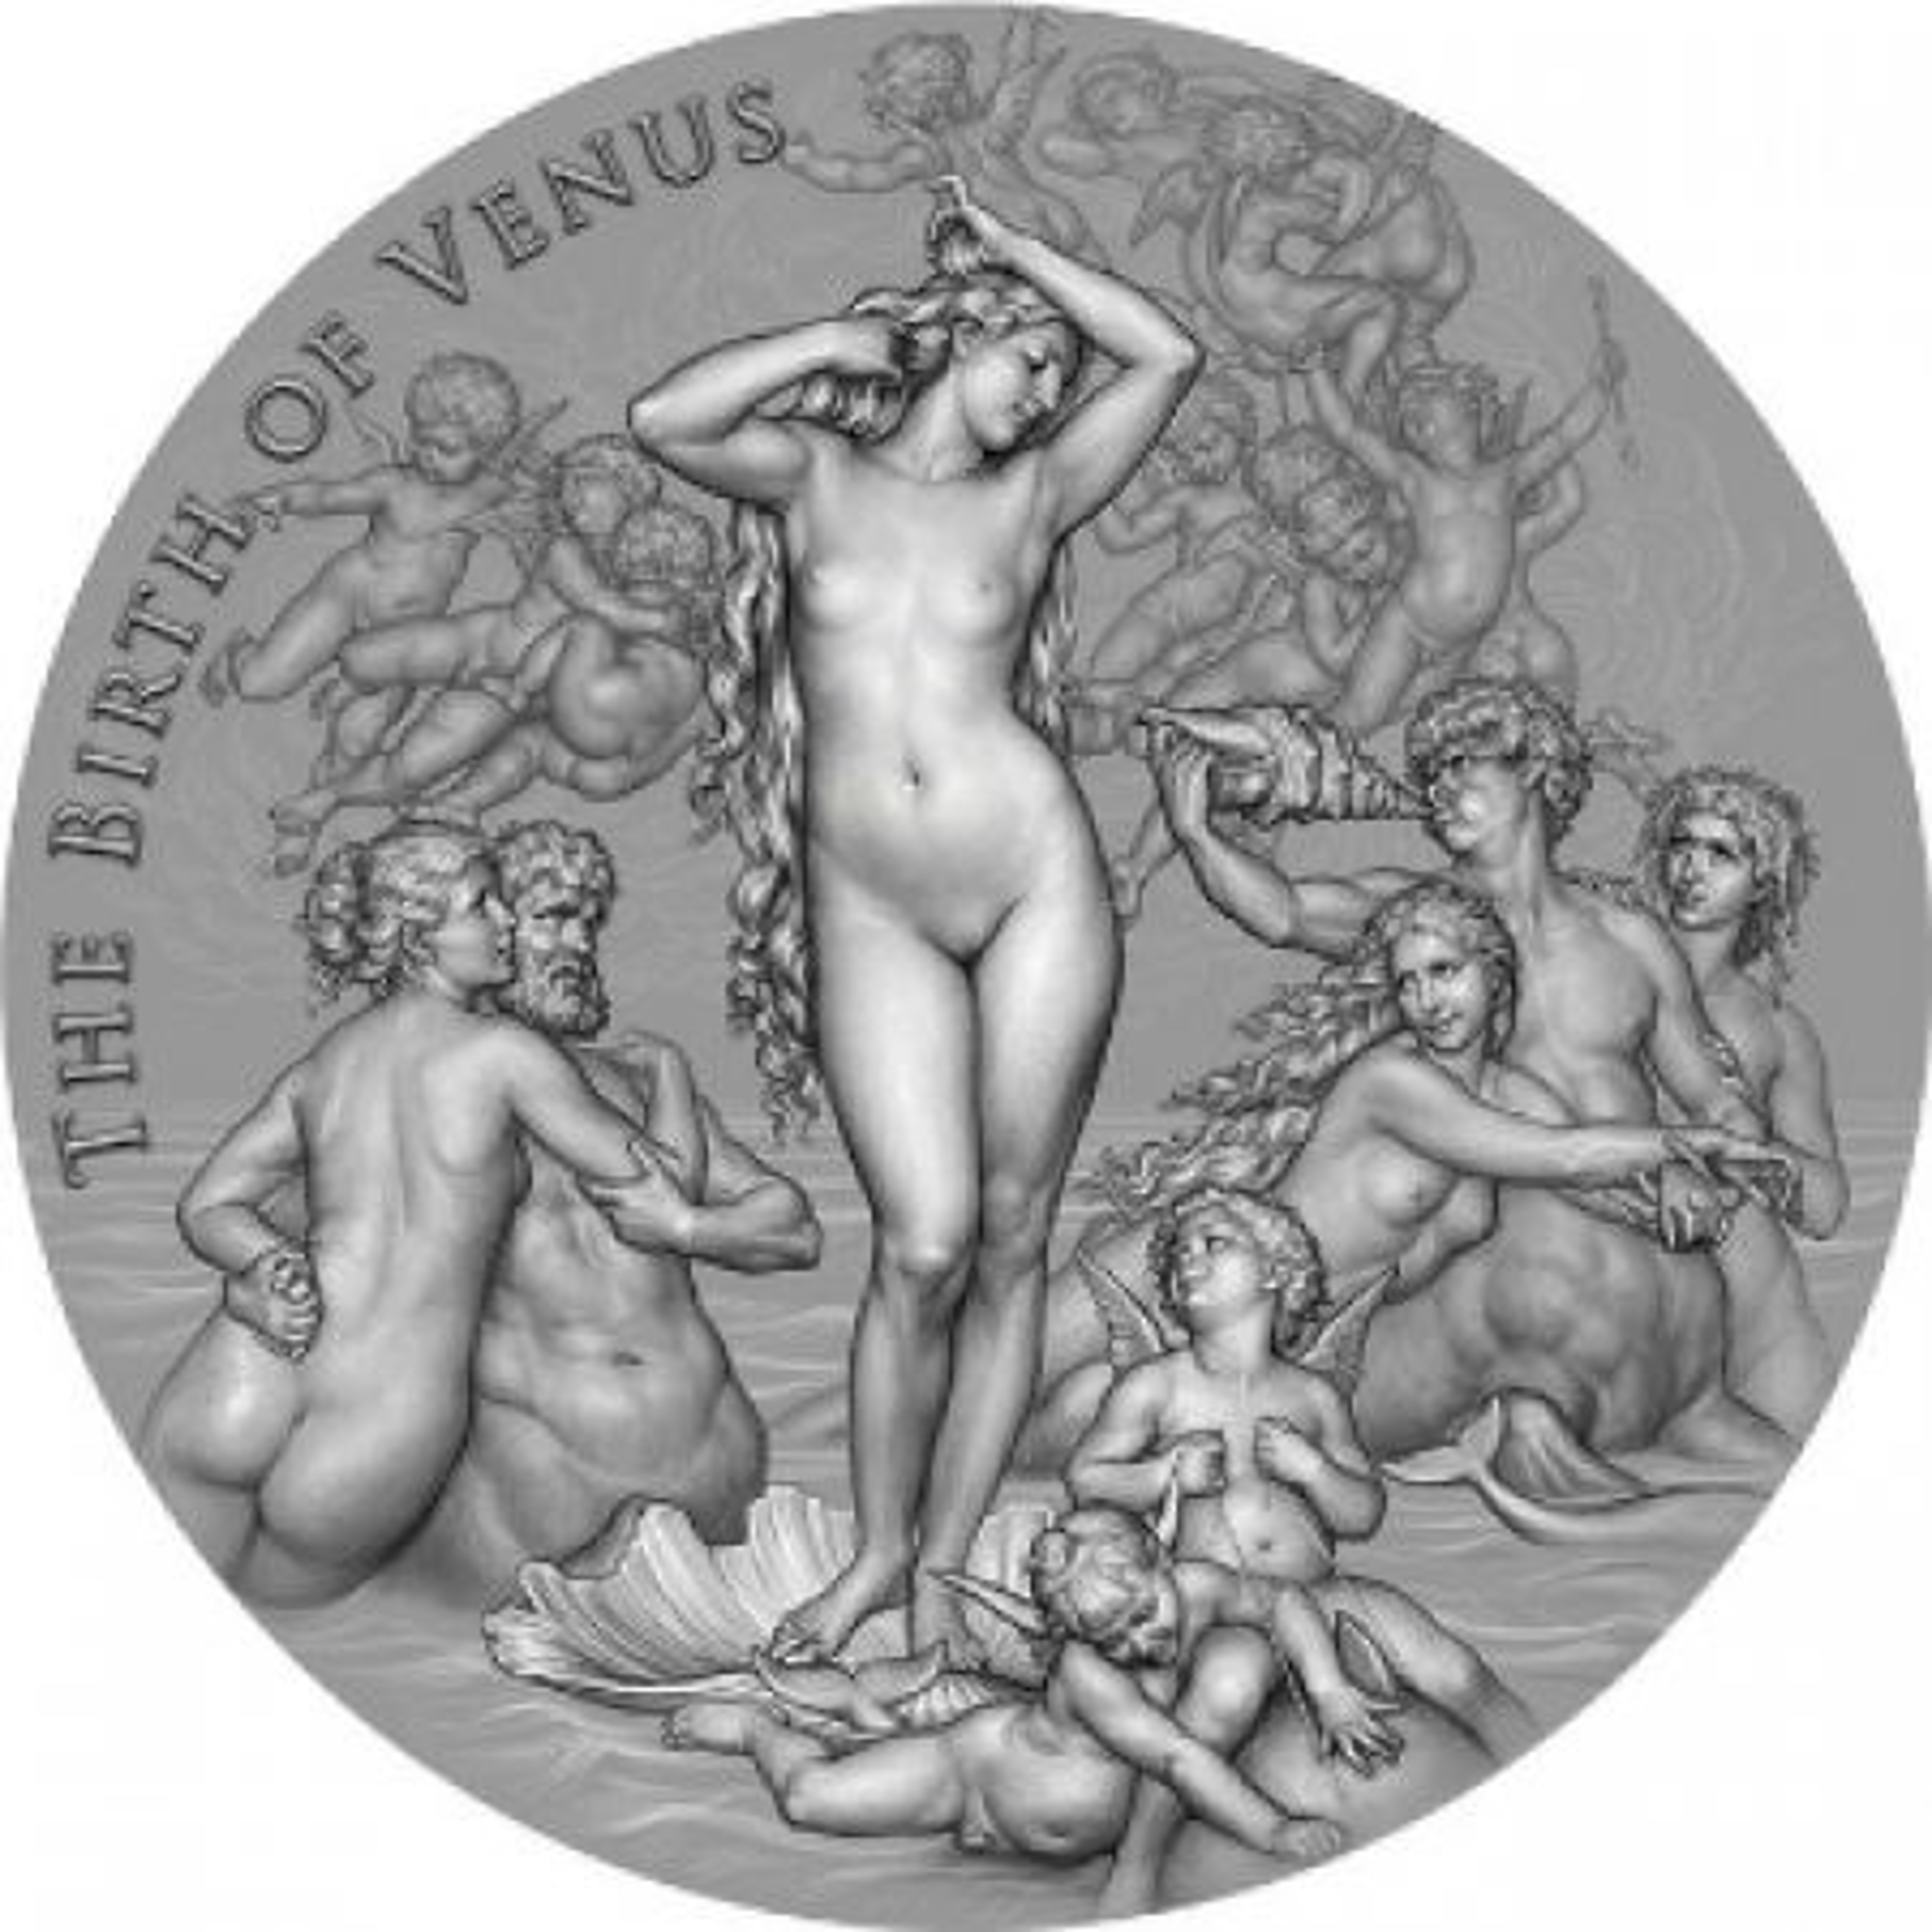 2 troy ounce zilveren munt Venus 2021